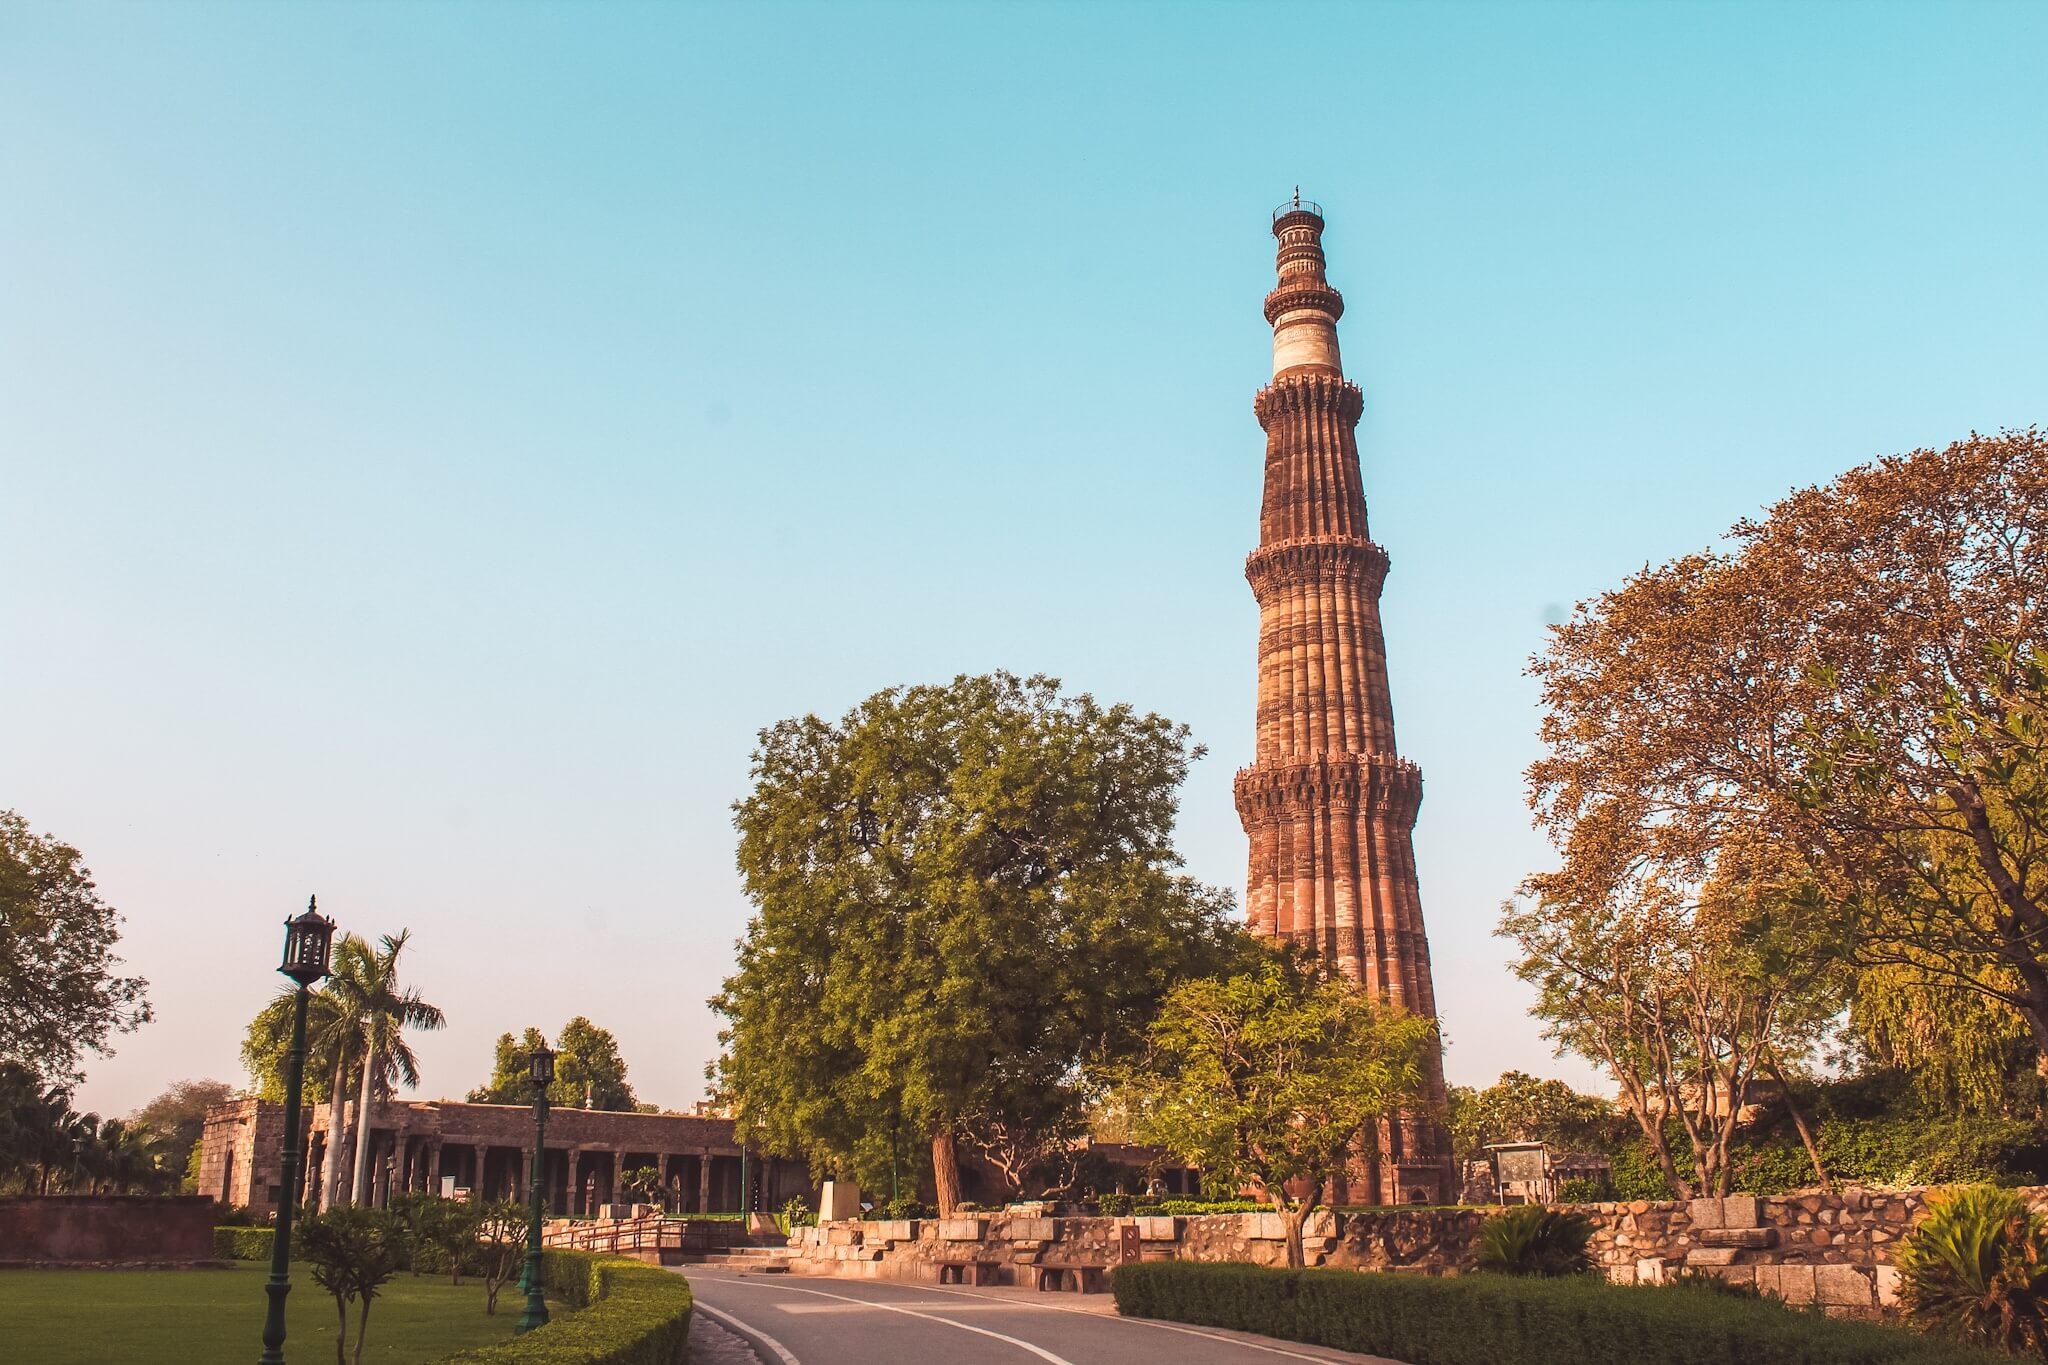 New Delhi Travel Guide - Places to visit in Delhi, India